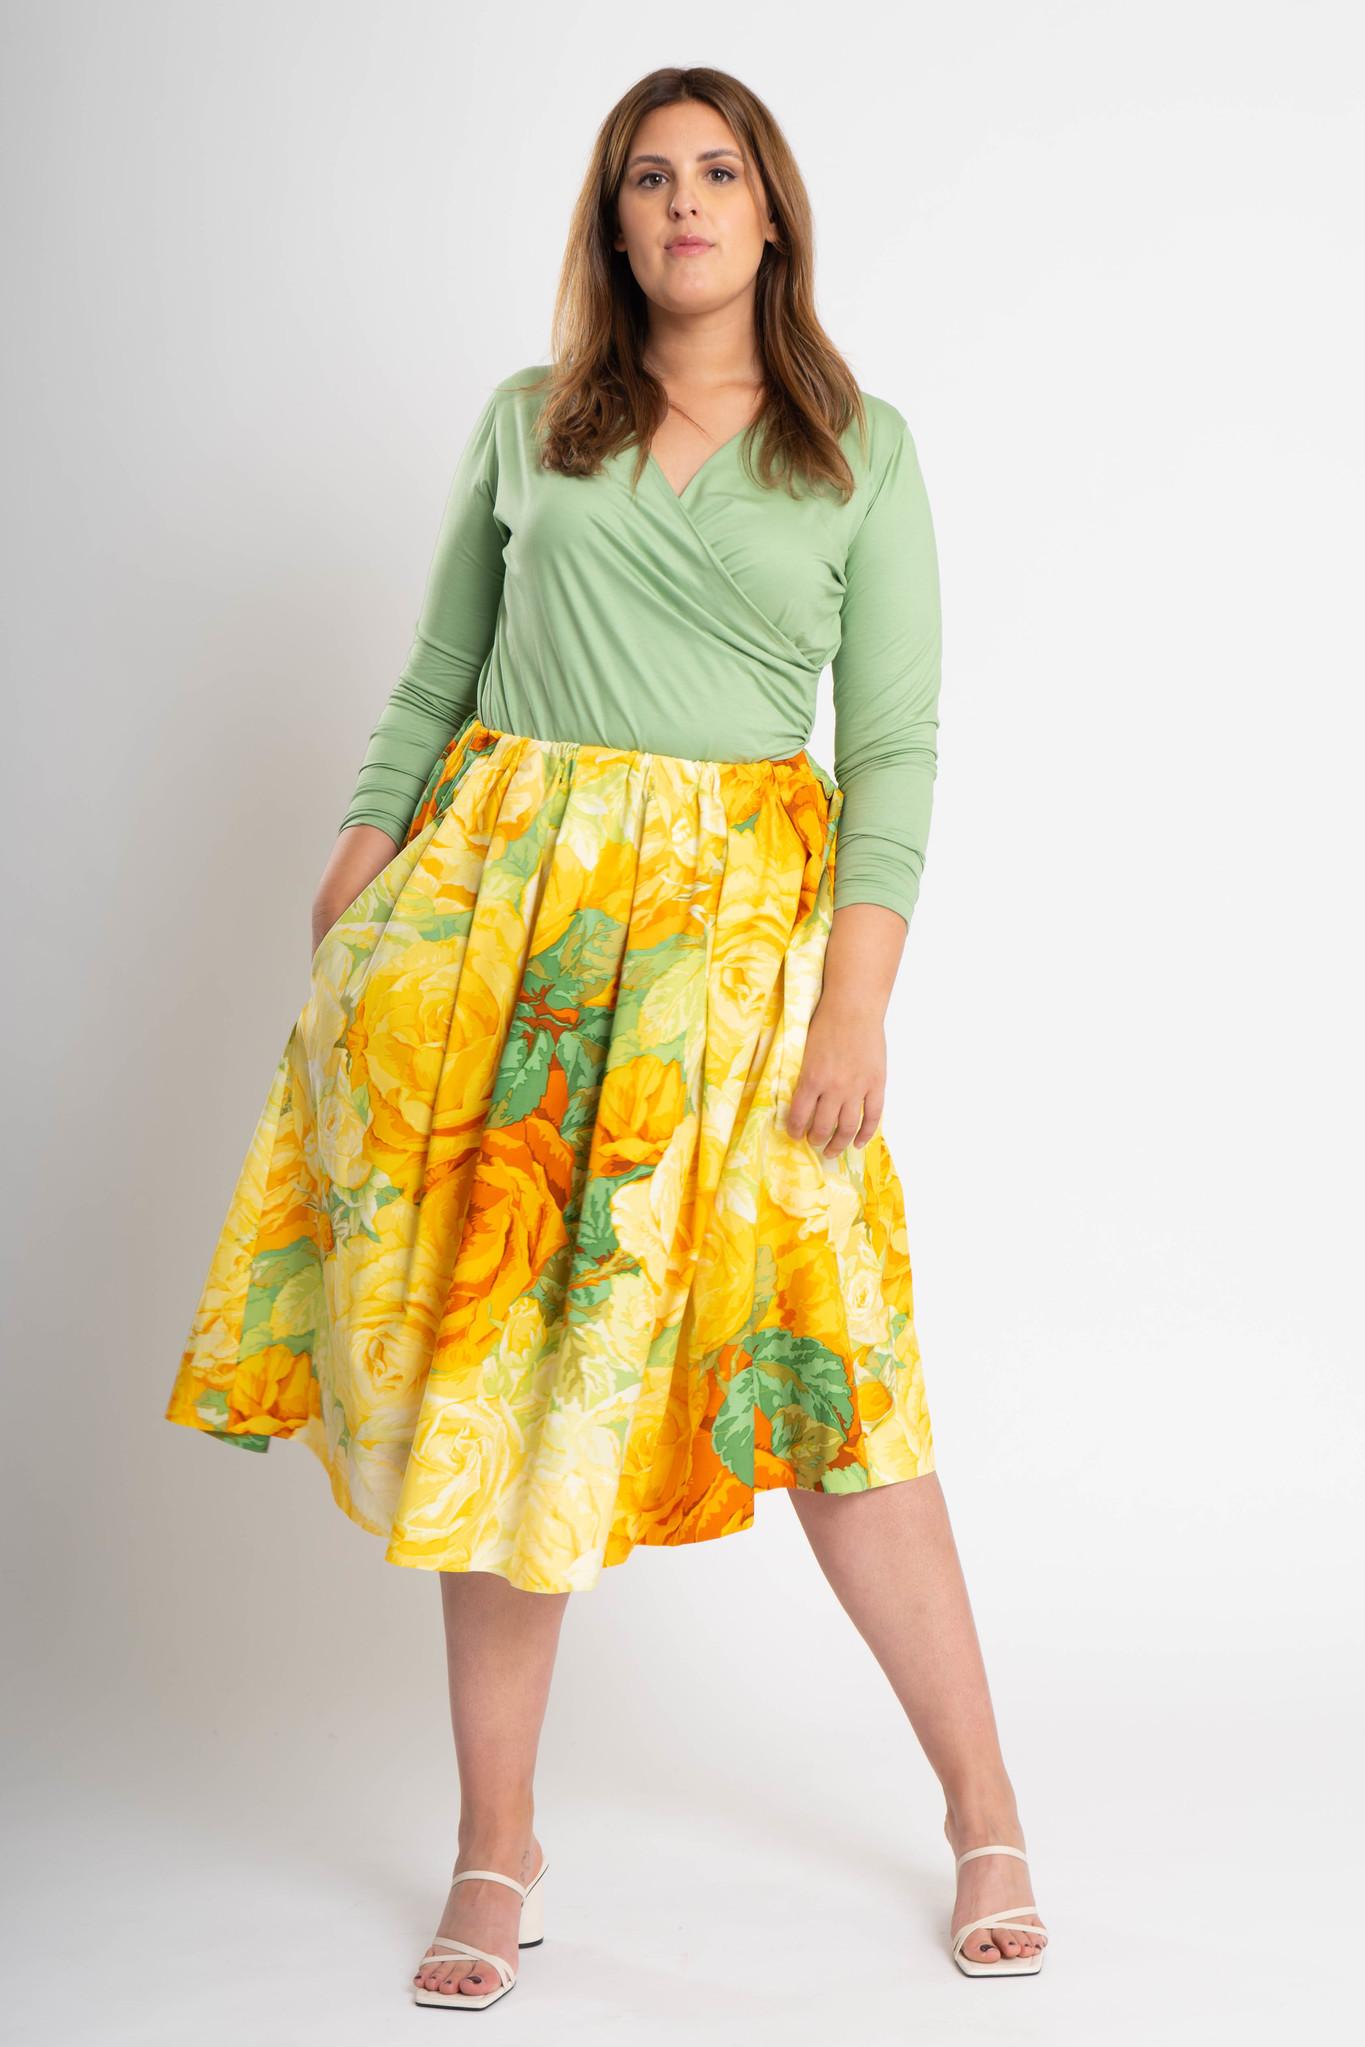 TULIP Skirt in Cotton-2